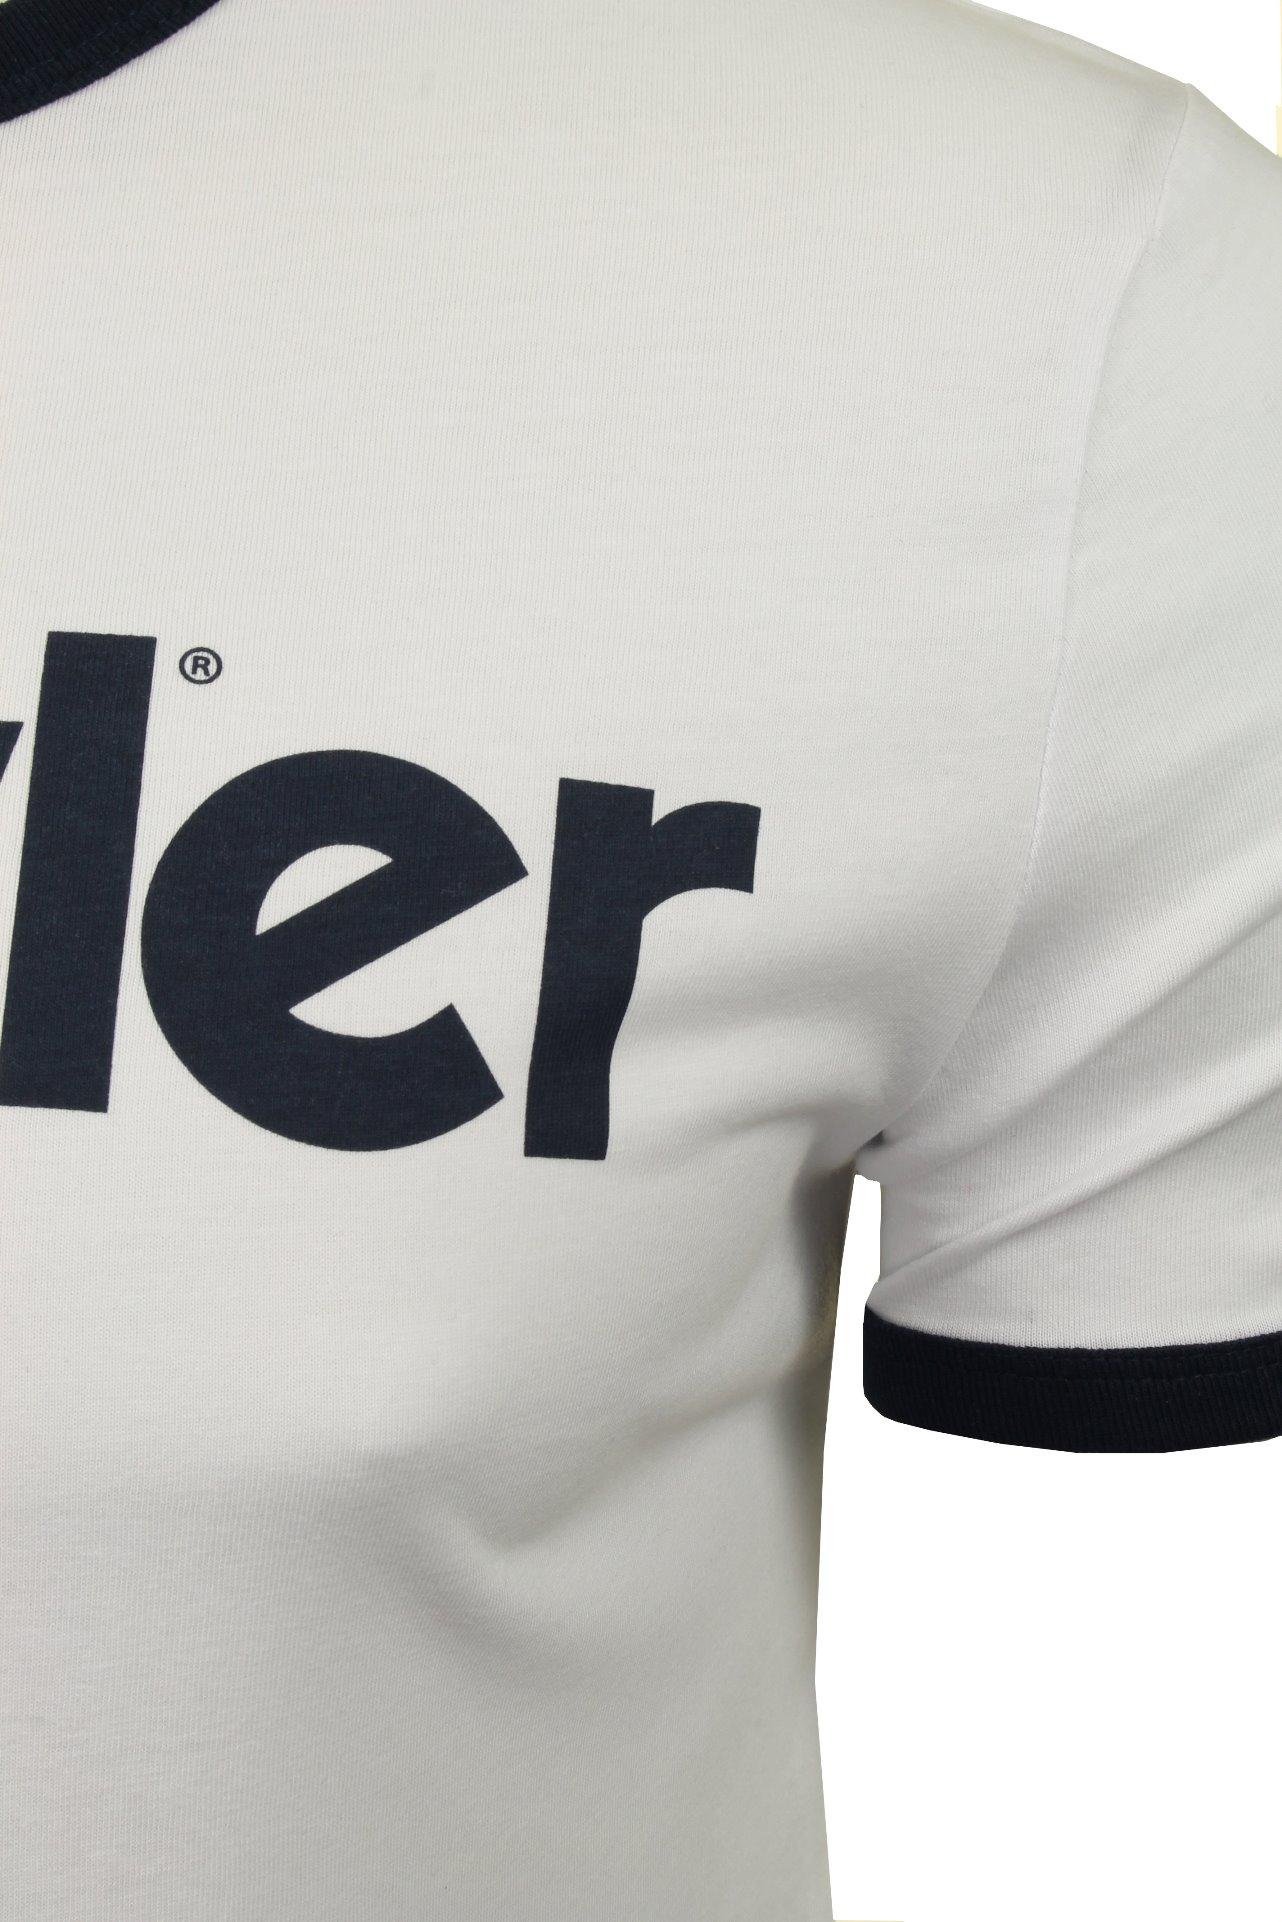 WRANGLER-034-Kabel-Tee-039-T-shirt-a-manches-courtes miniature 7